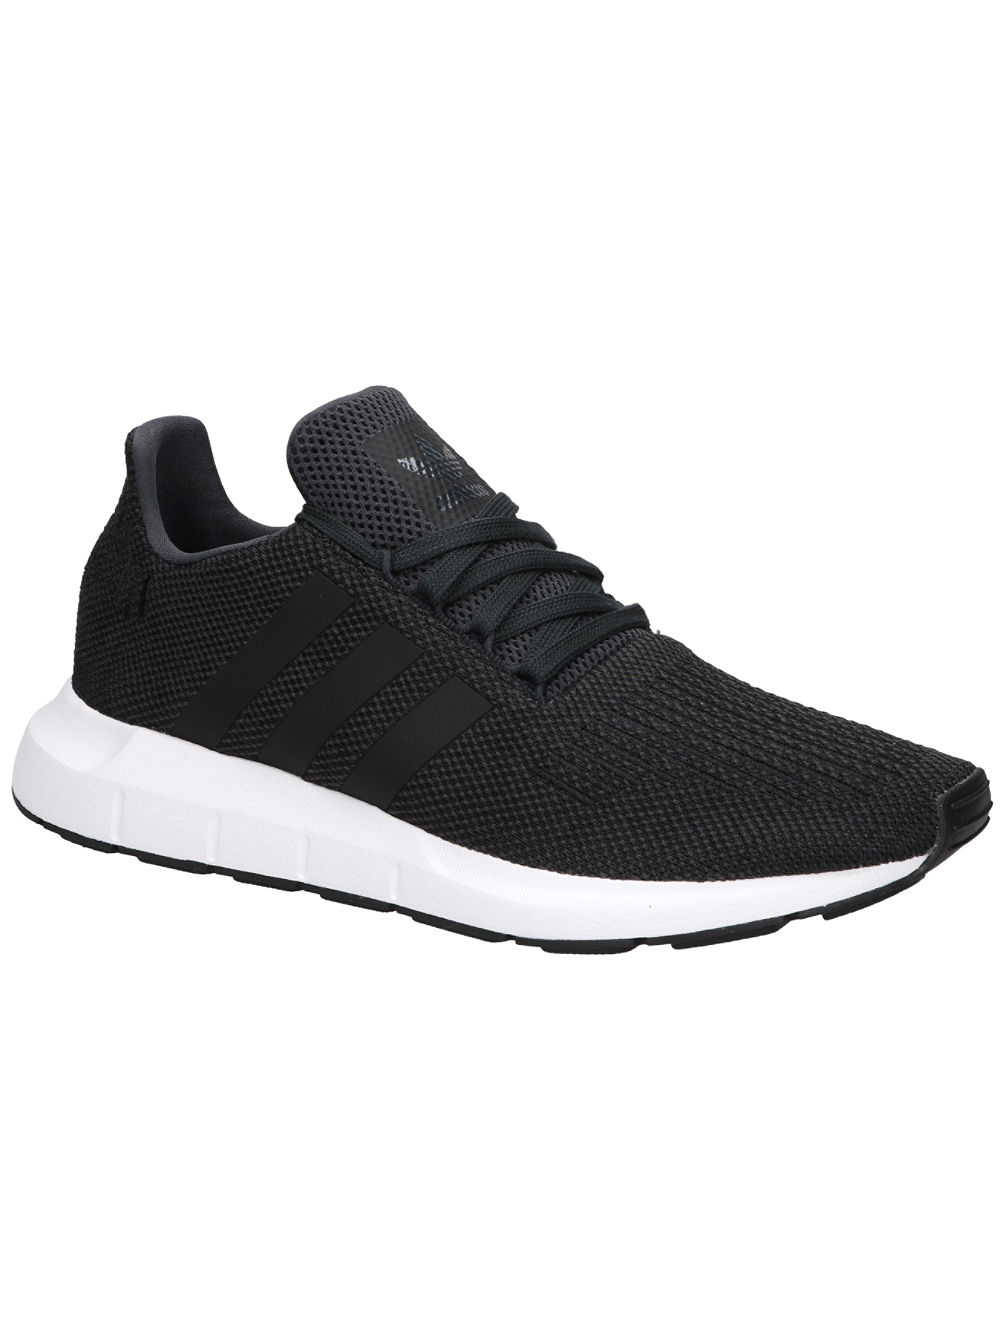 finest selection 11063 82cb6 adidas Originals Swift Run Sneakers